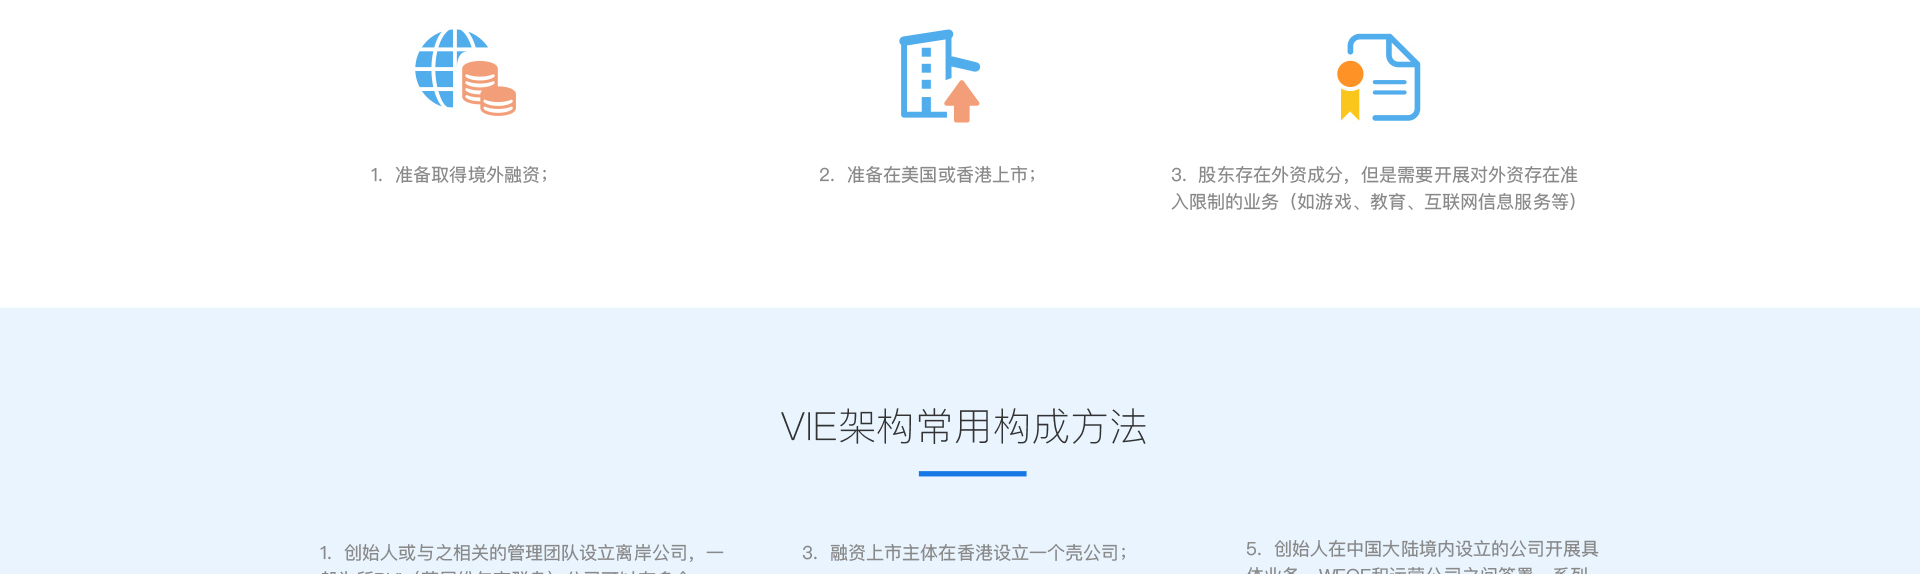 VIE架构设计_05.jpg